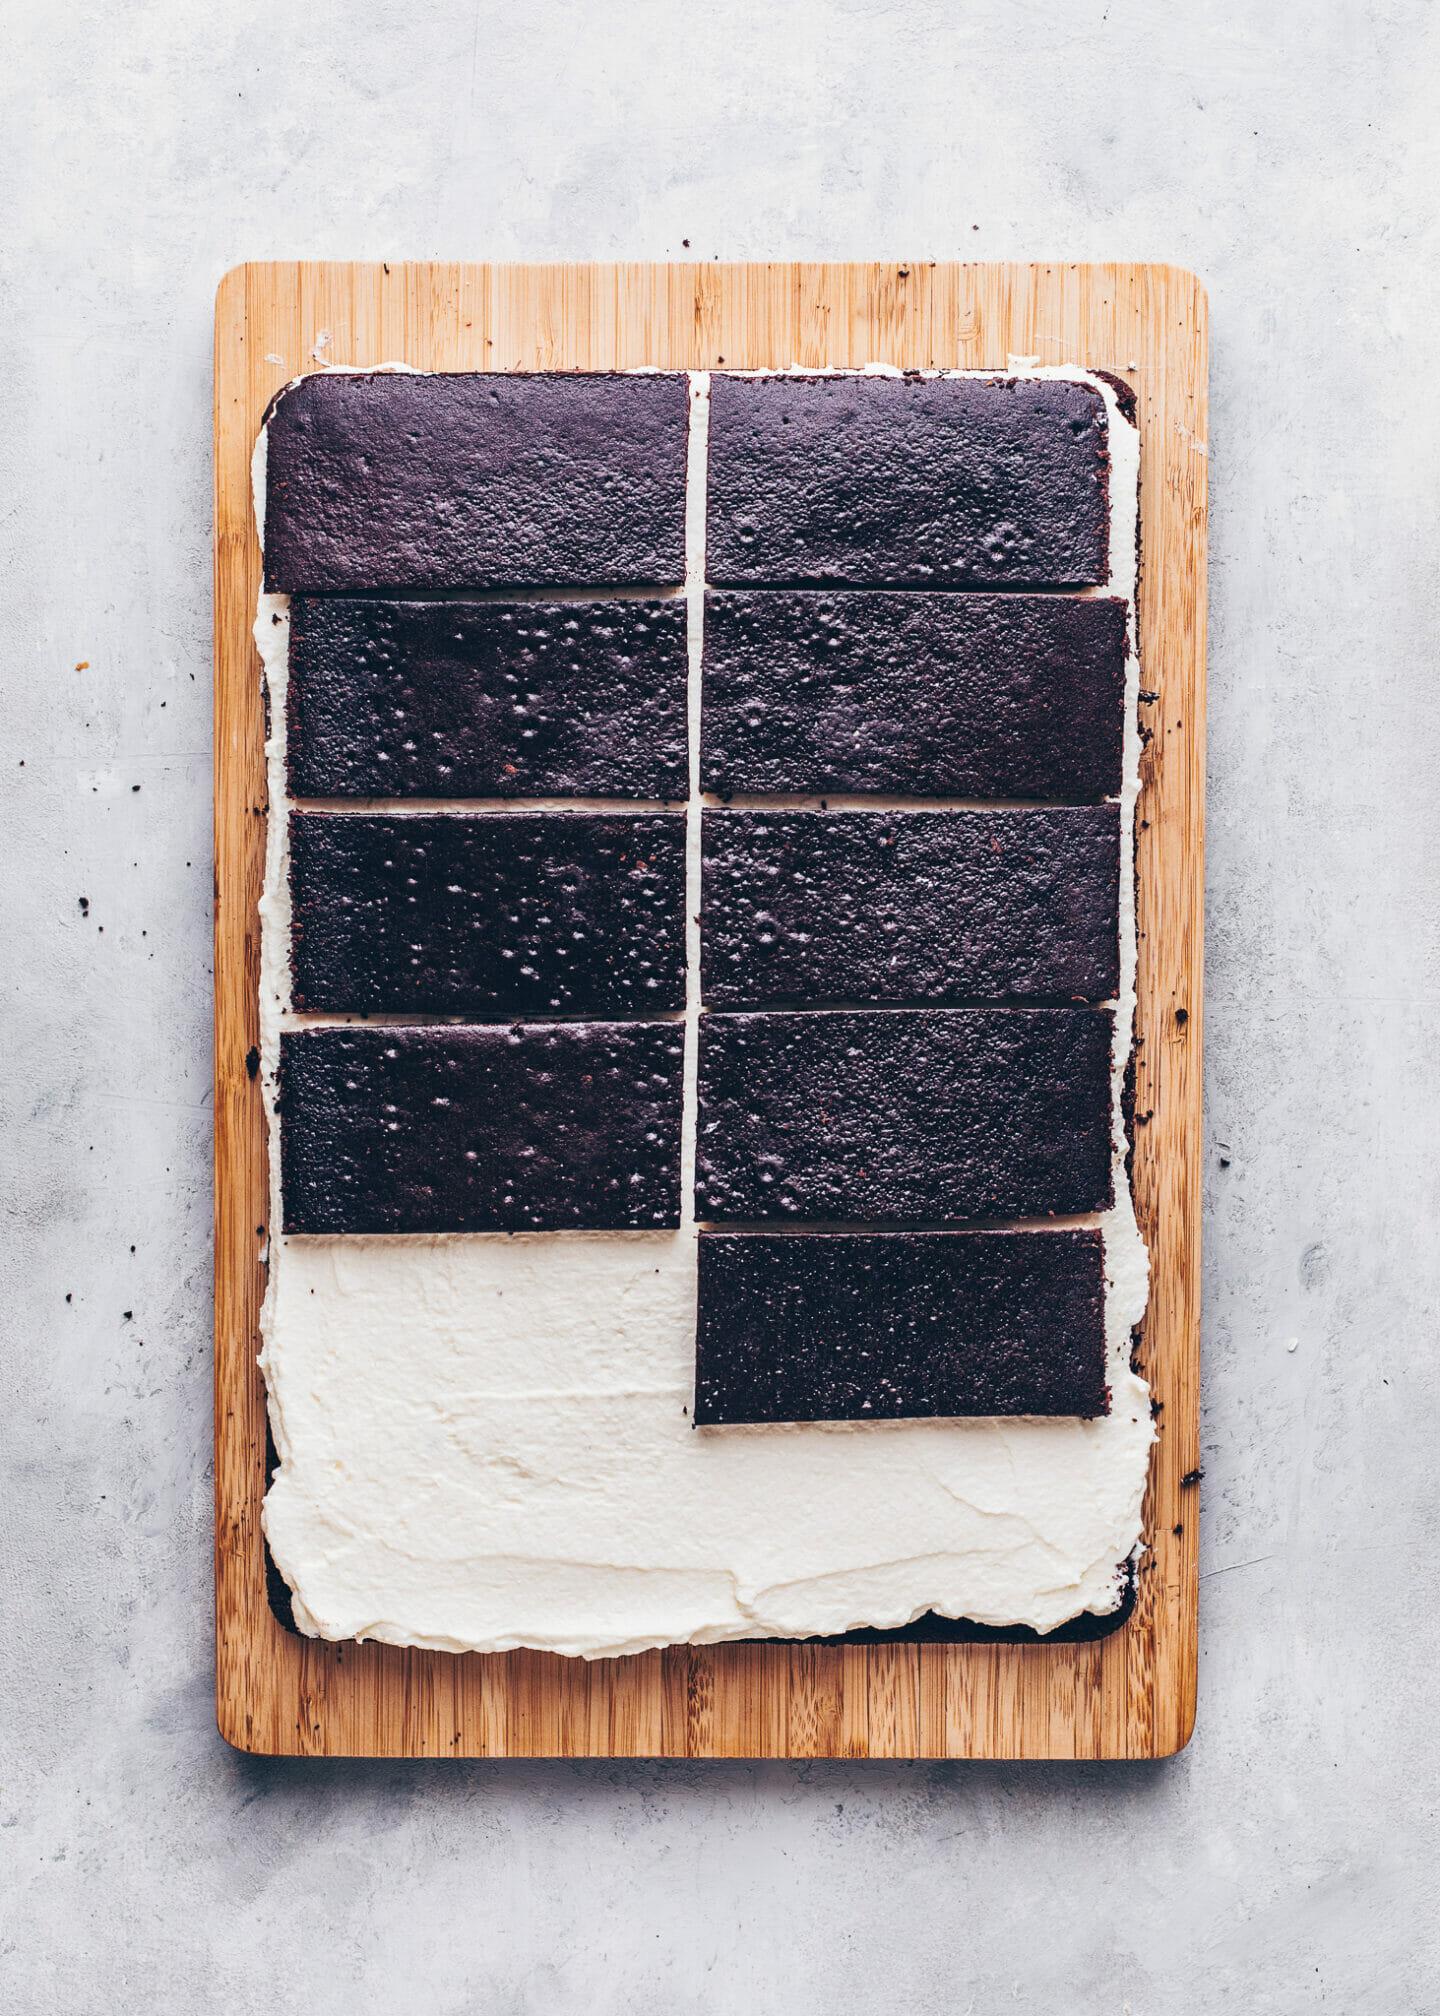 how to make vegan milk slices